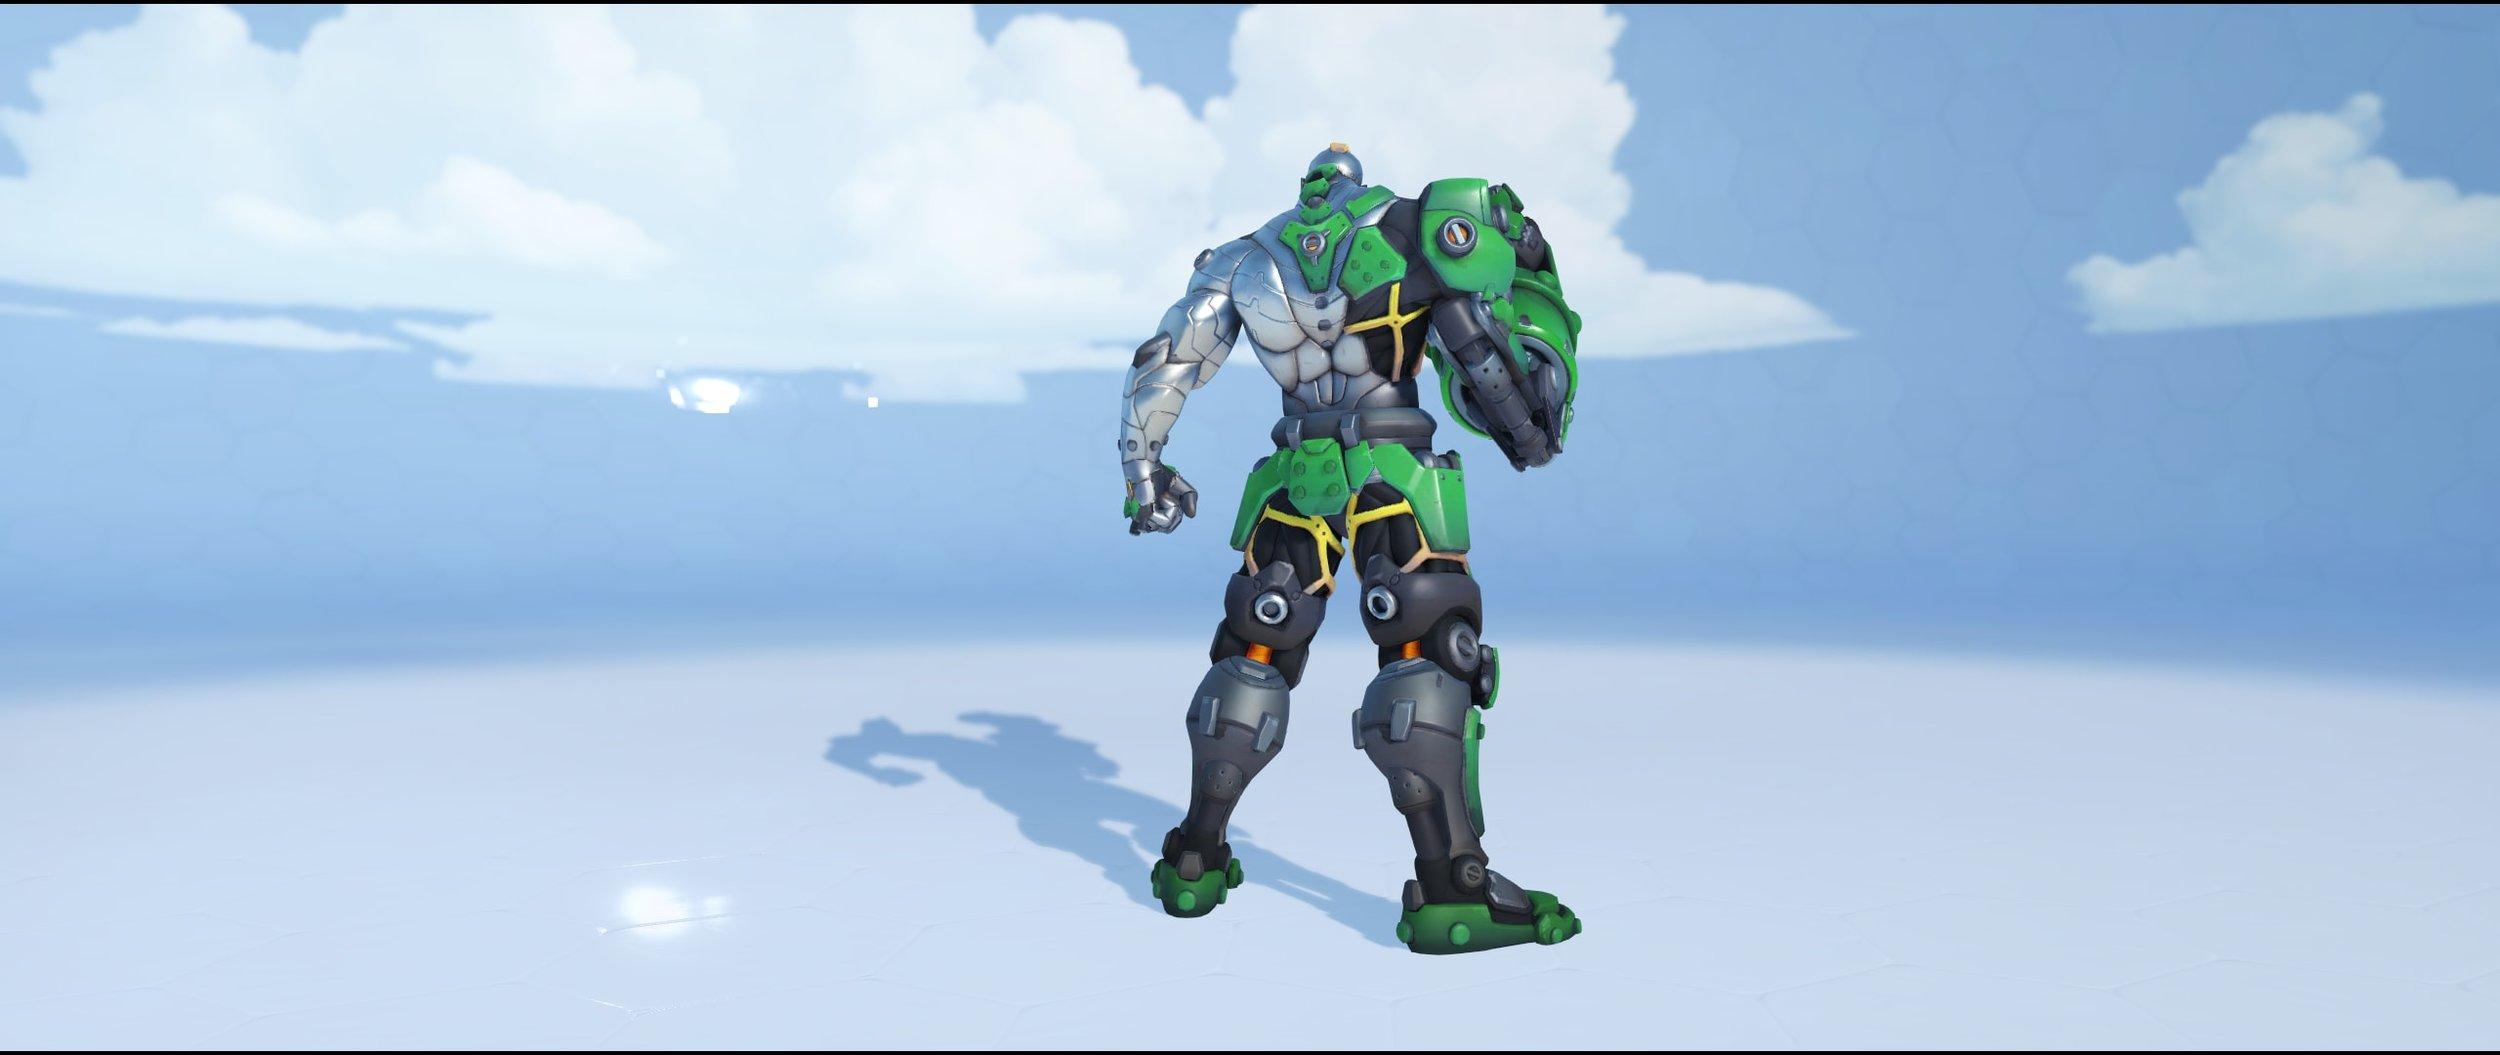 Irin back legendary skin Doomfist Overwatch.jpg